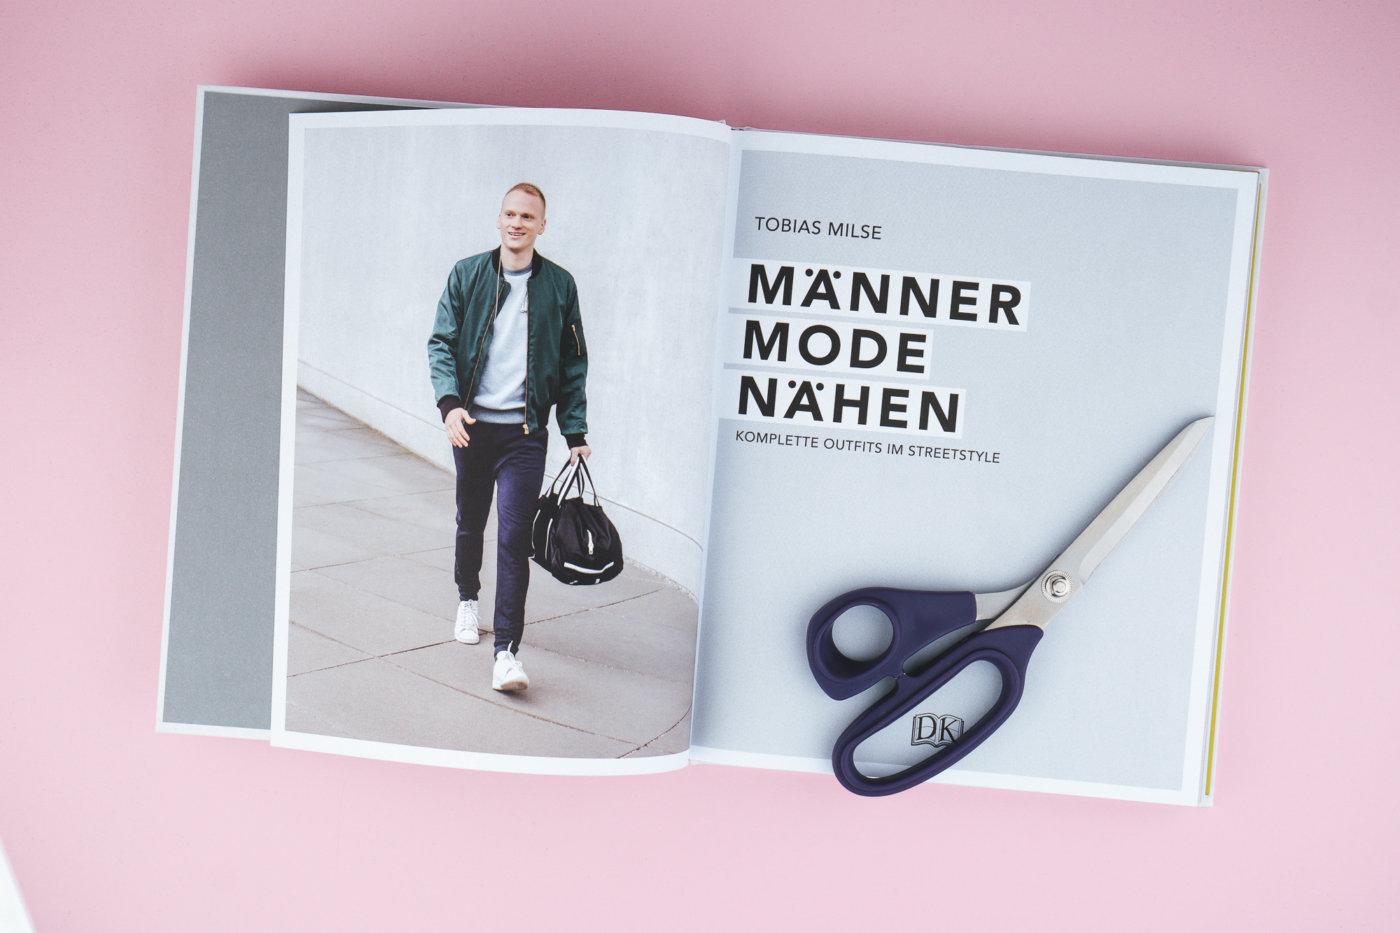 männer mode nähen An die Nähmaschine, fertig, »Männer Mode nähen« mit Tobias Milse